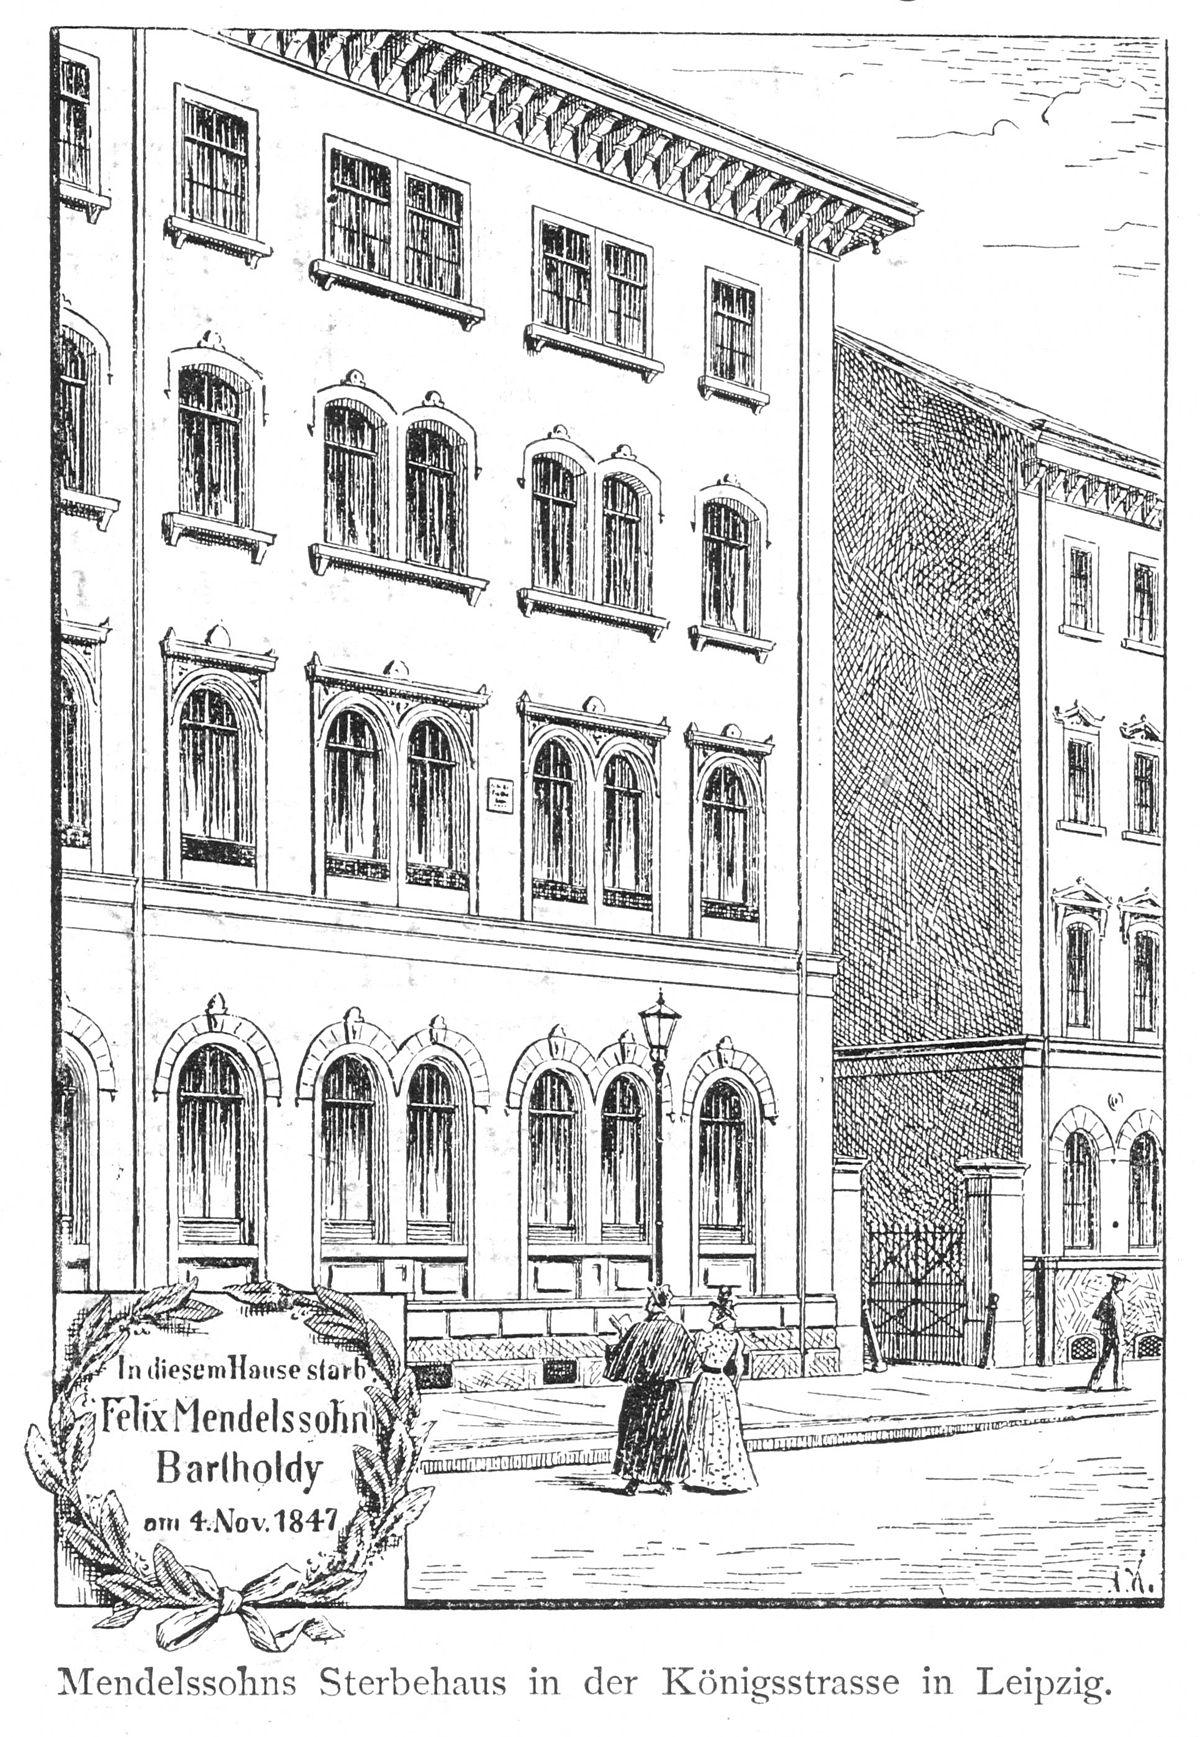 Mendelssohn Haus Leipzig –